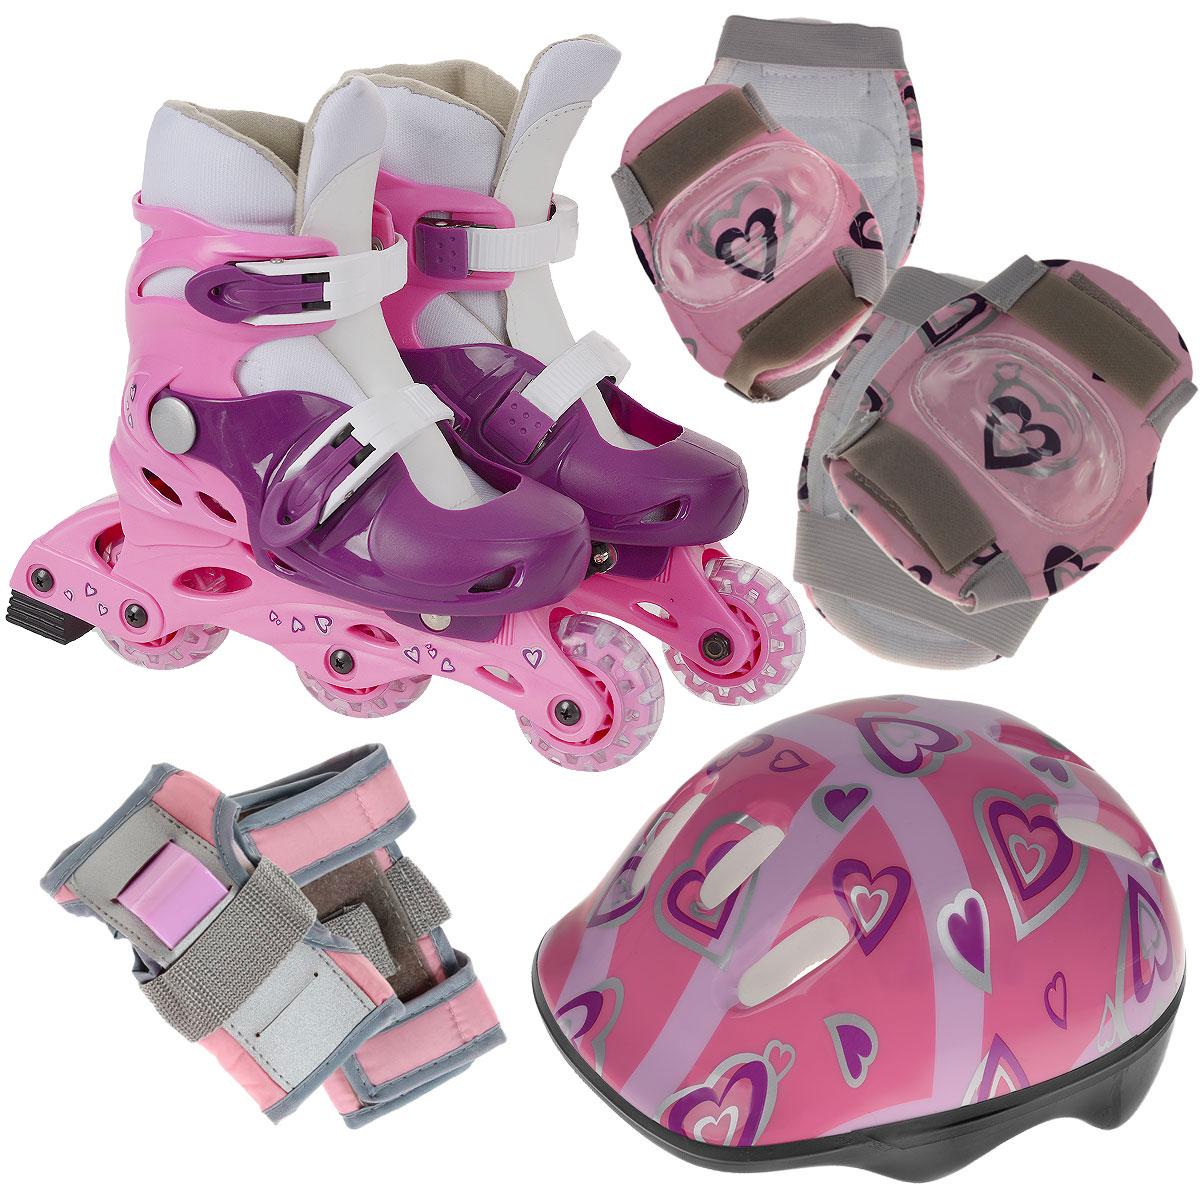 Action Комплект: коньки роликовые, шлем, защита. PW-120P